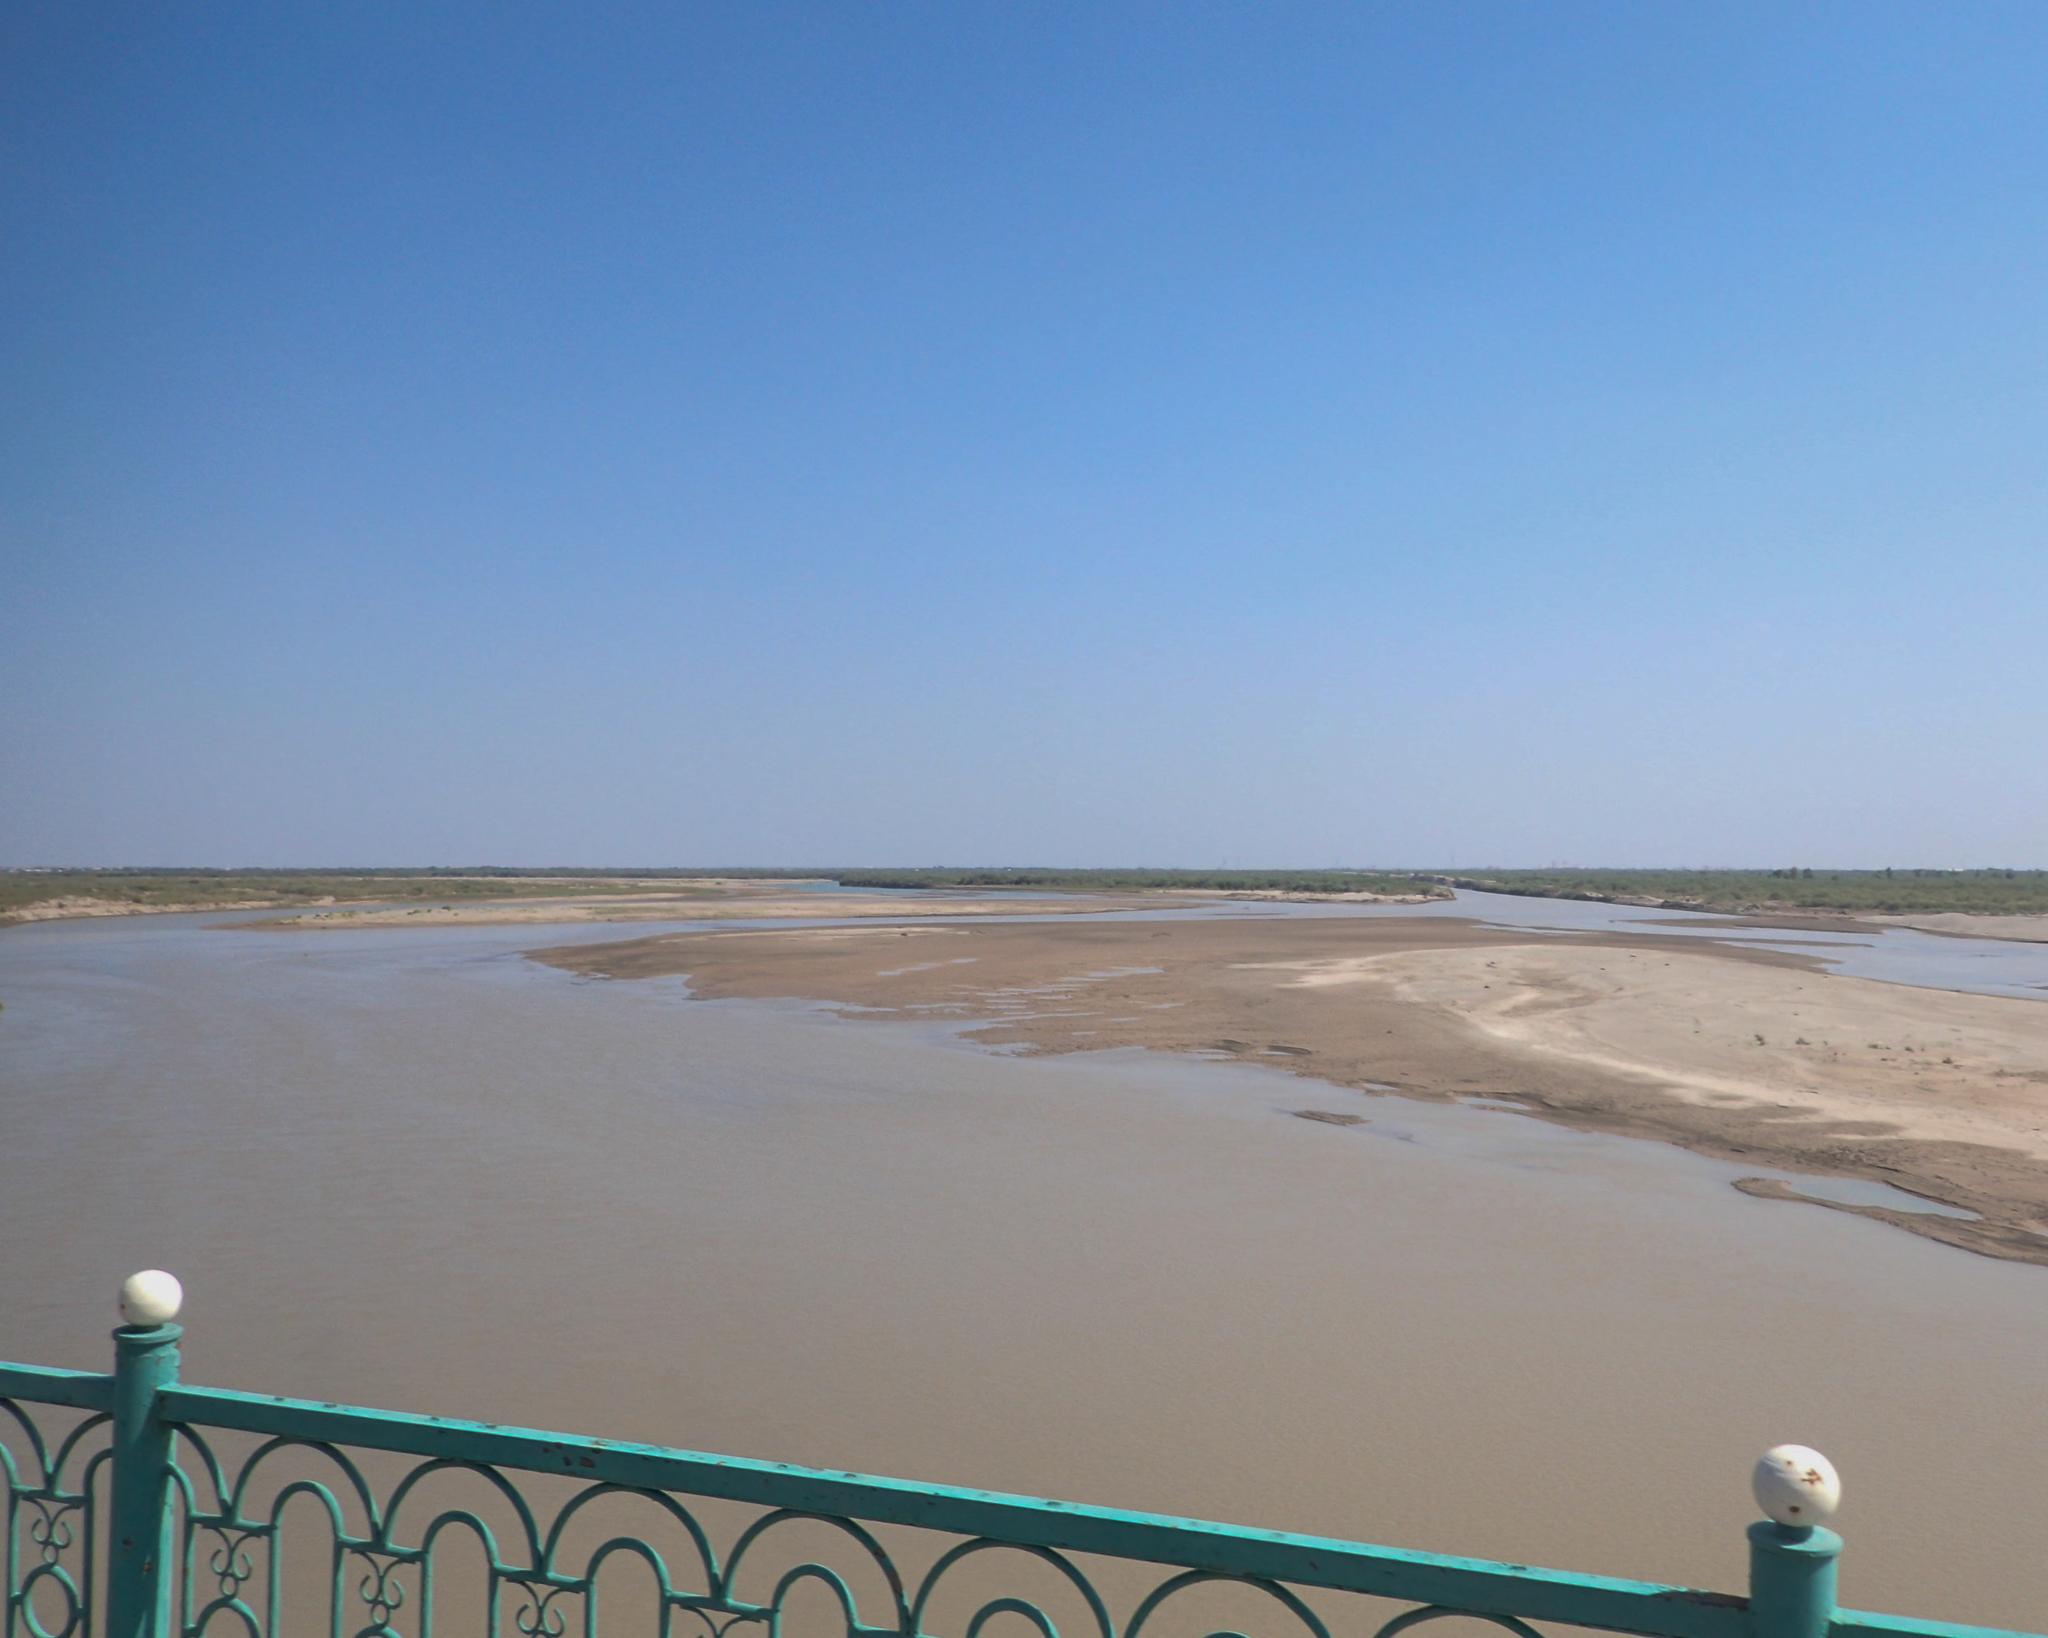 The Amu Darya (Oxus) river